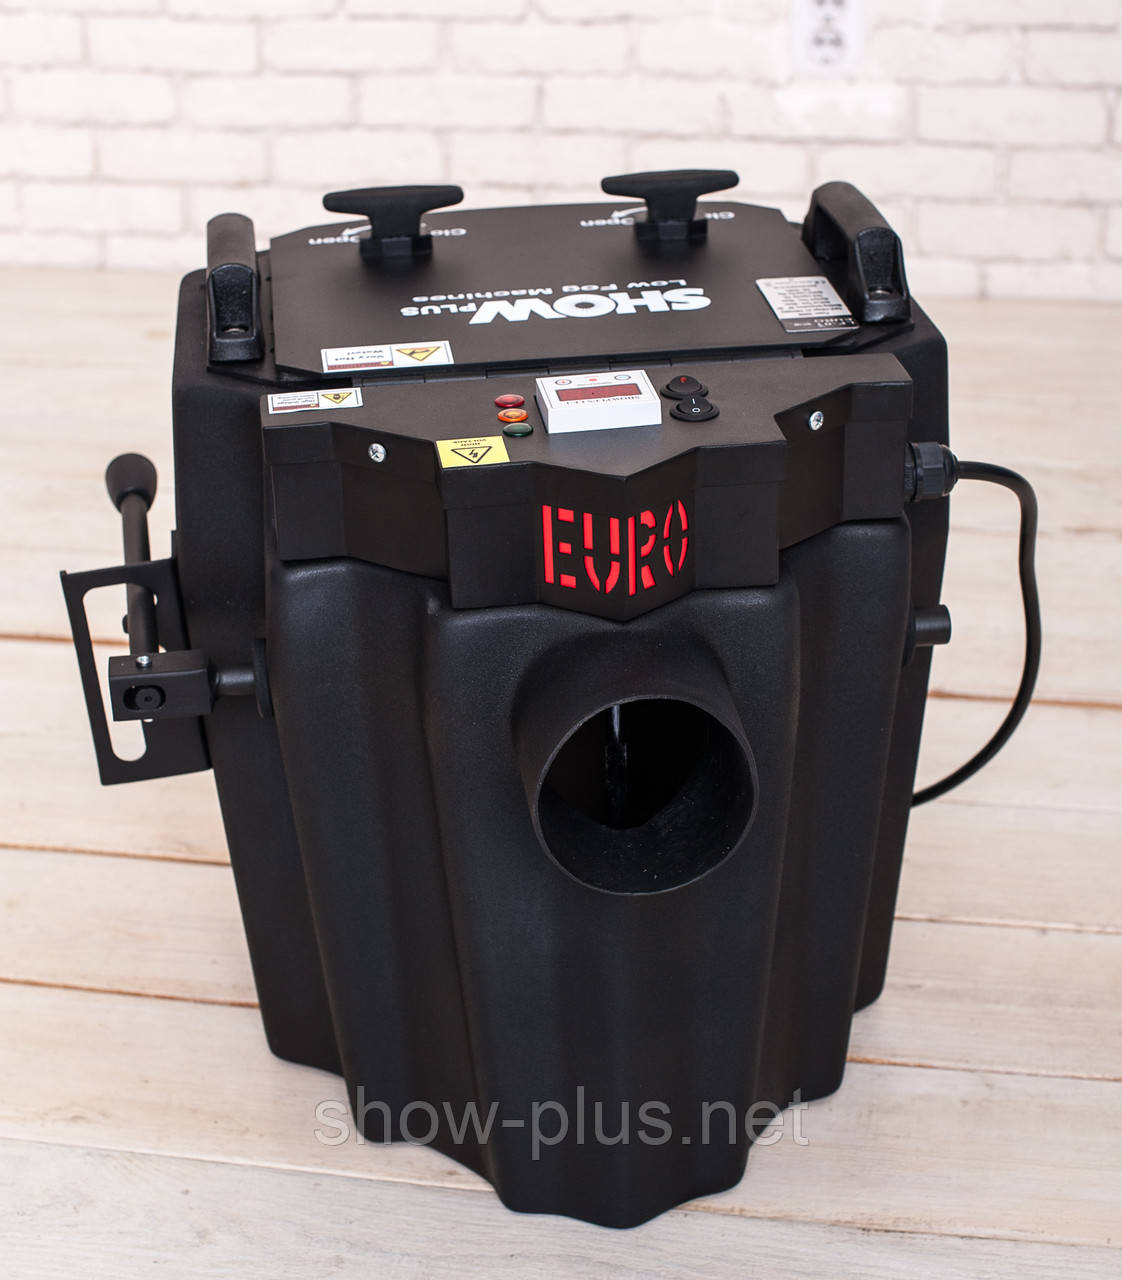 Генератор тяжелого низкого дыма SHOWplus LF-01 EURO